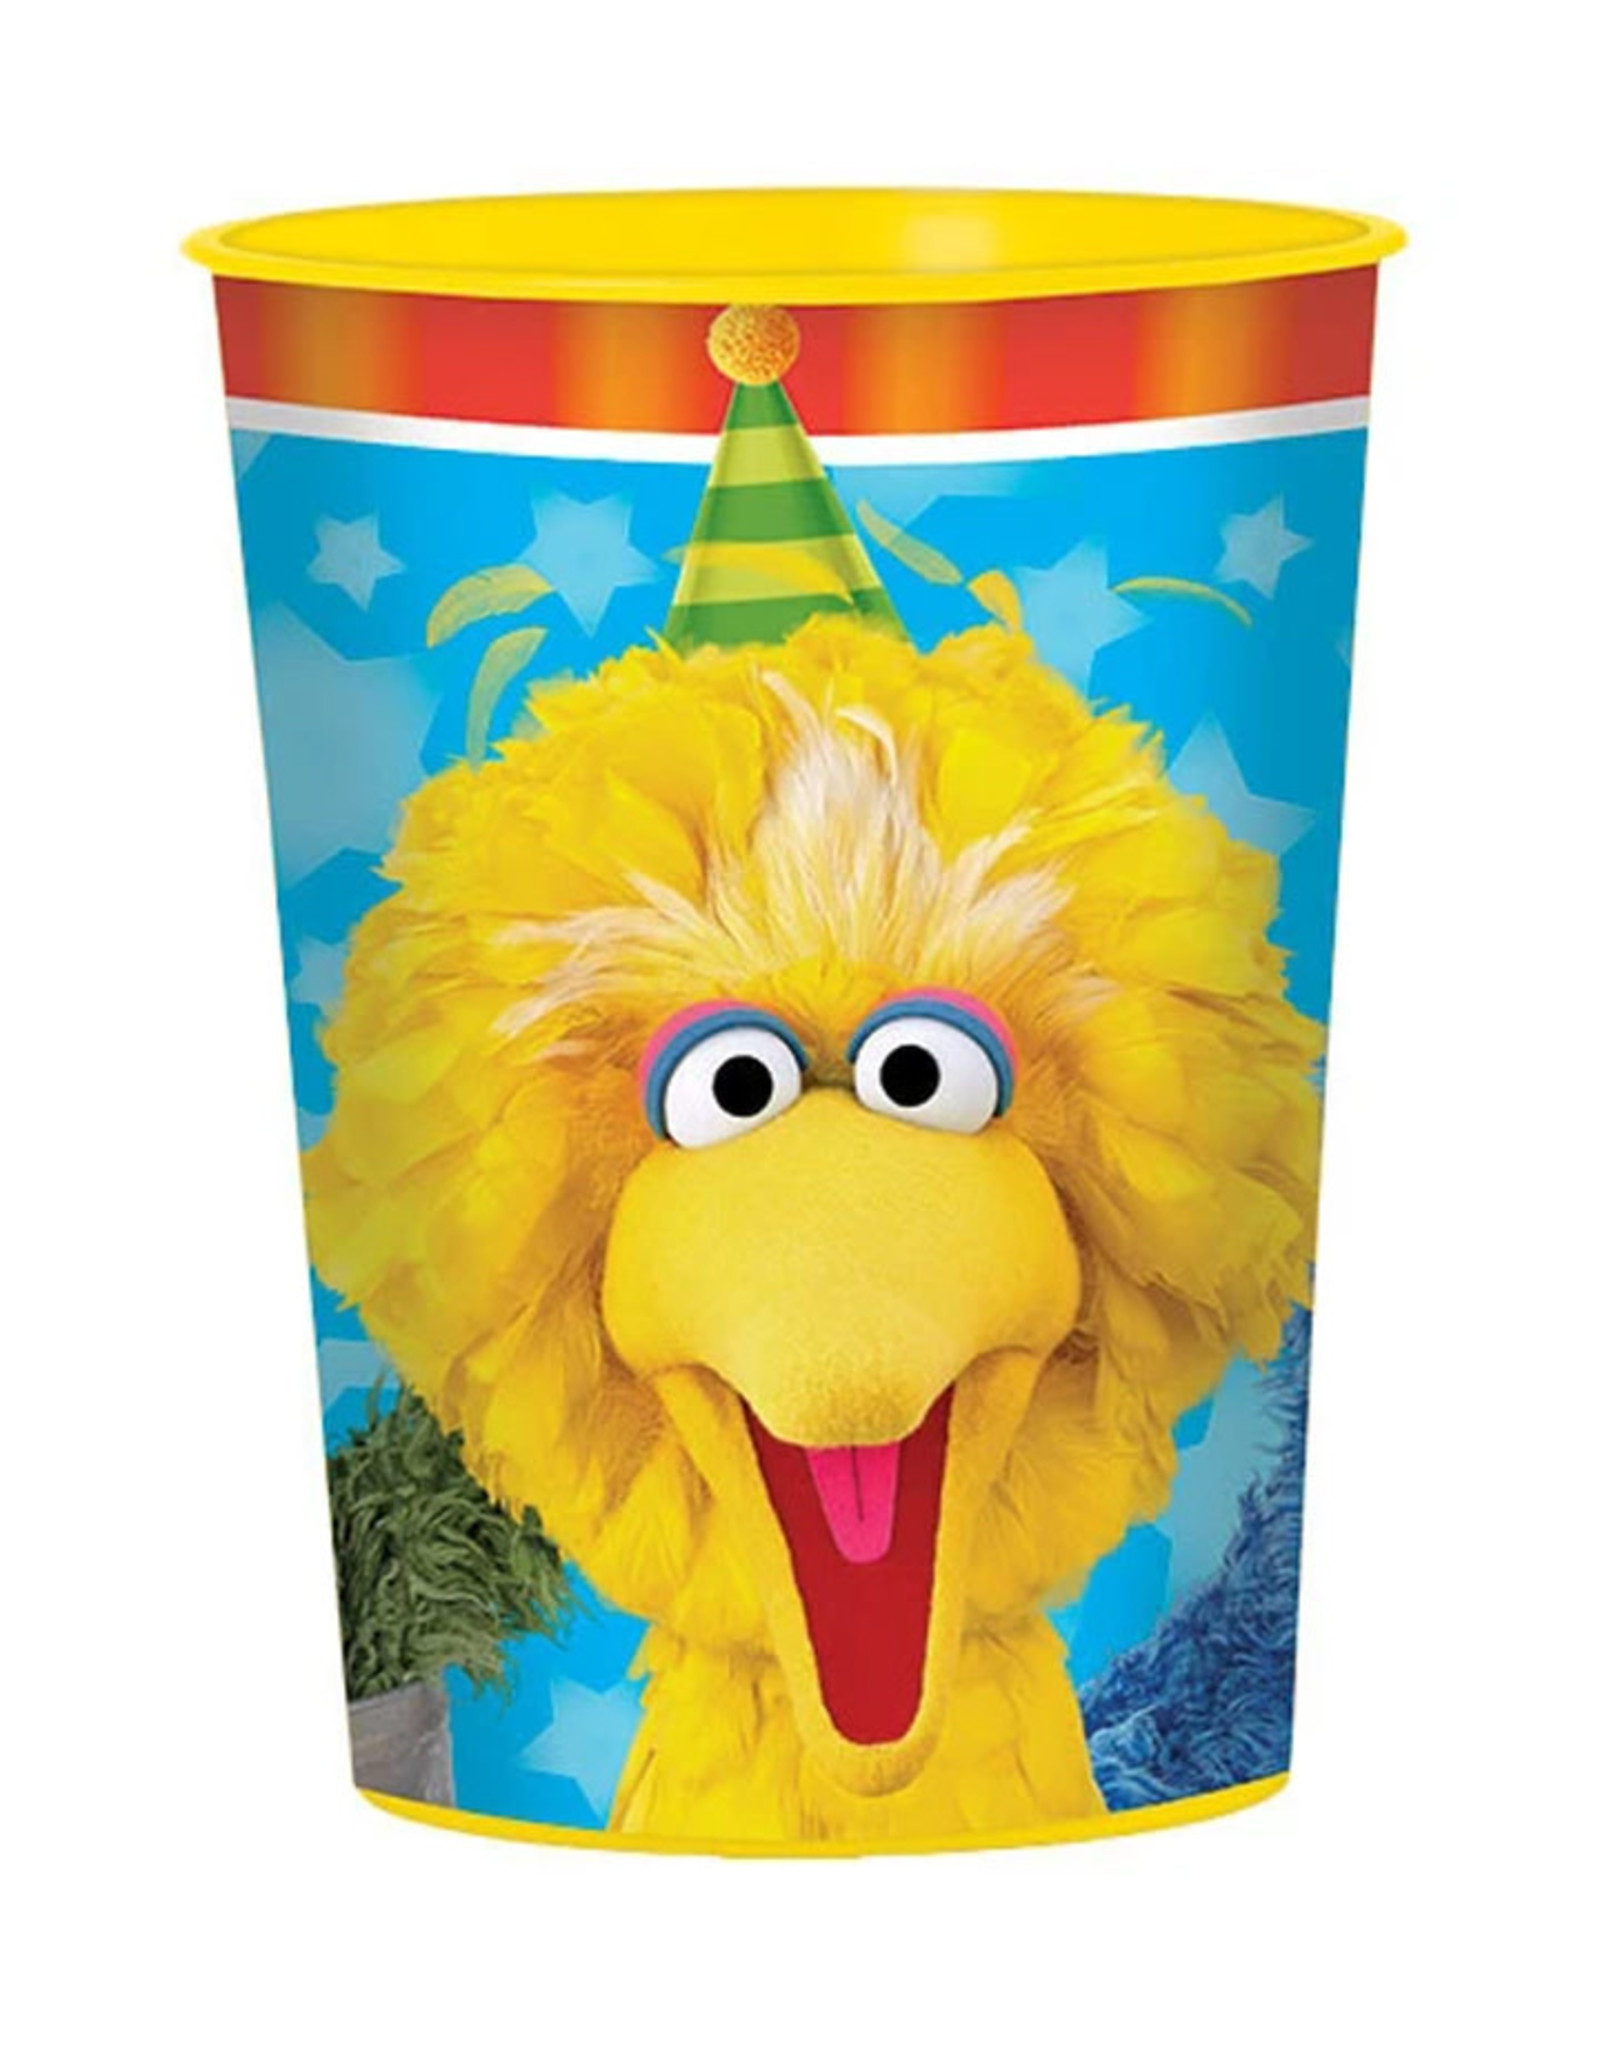 Sesame Street 16oz Plastic Favor Cup